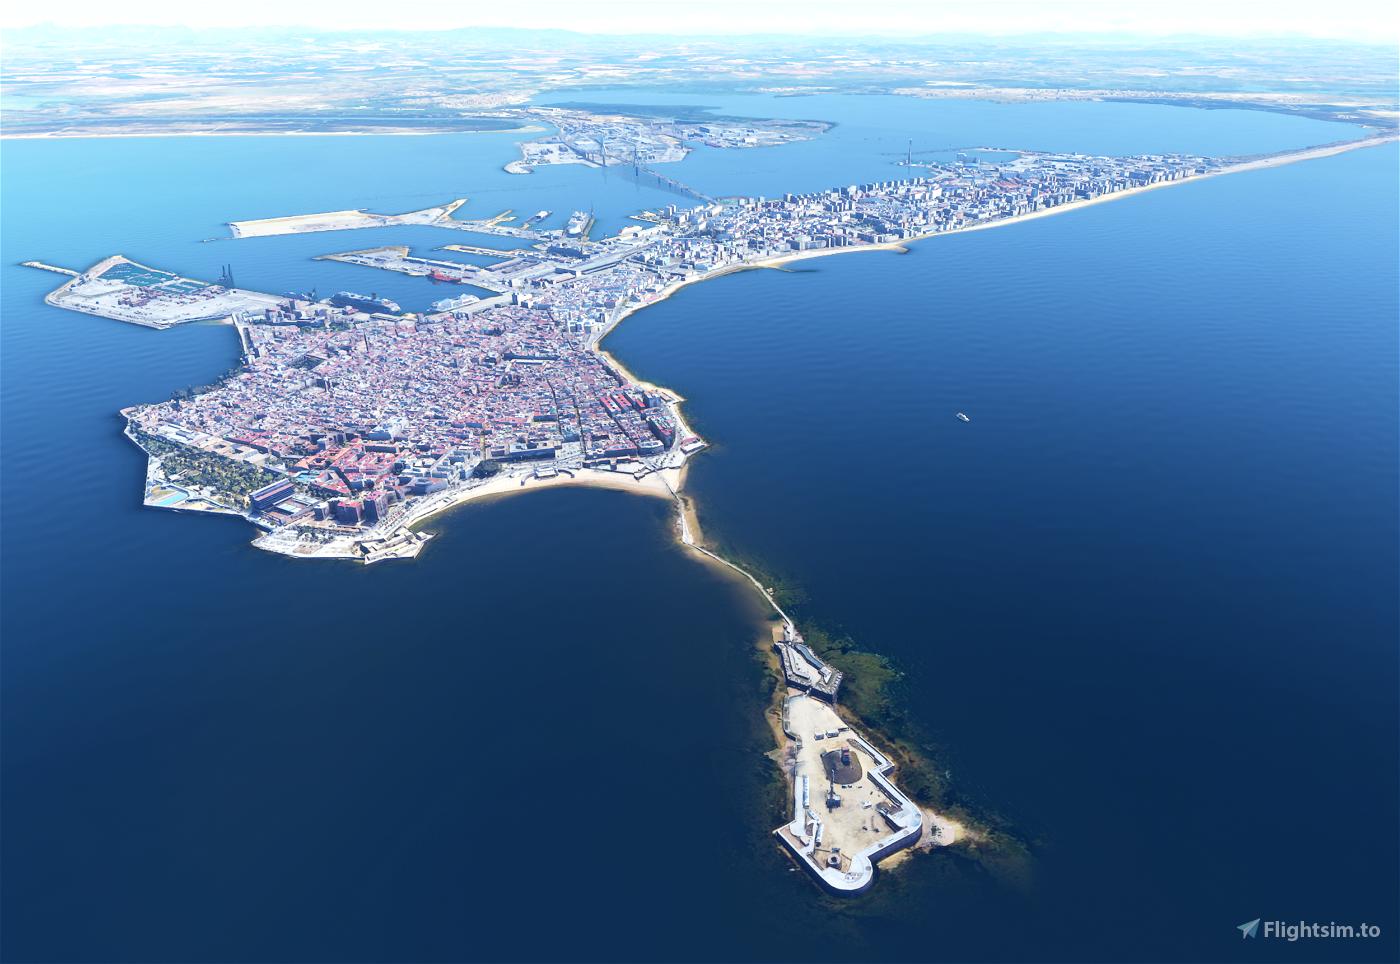 Updated - Cadiz Landmarks - Full City in Photogrammetry Flight Simulator 2020